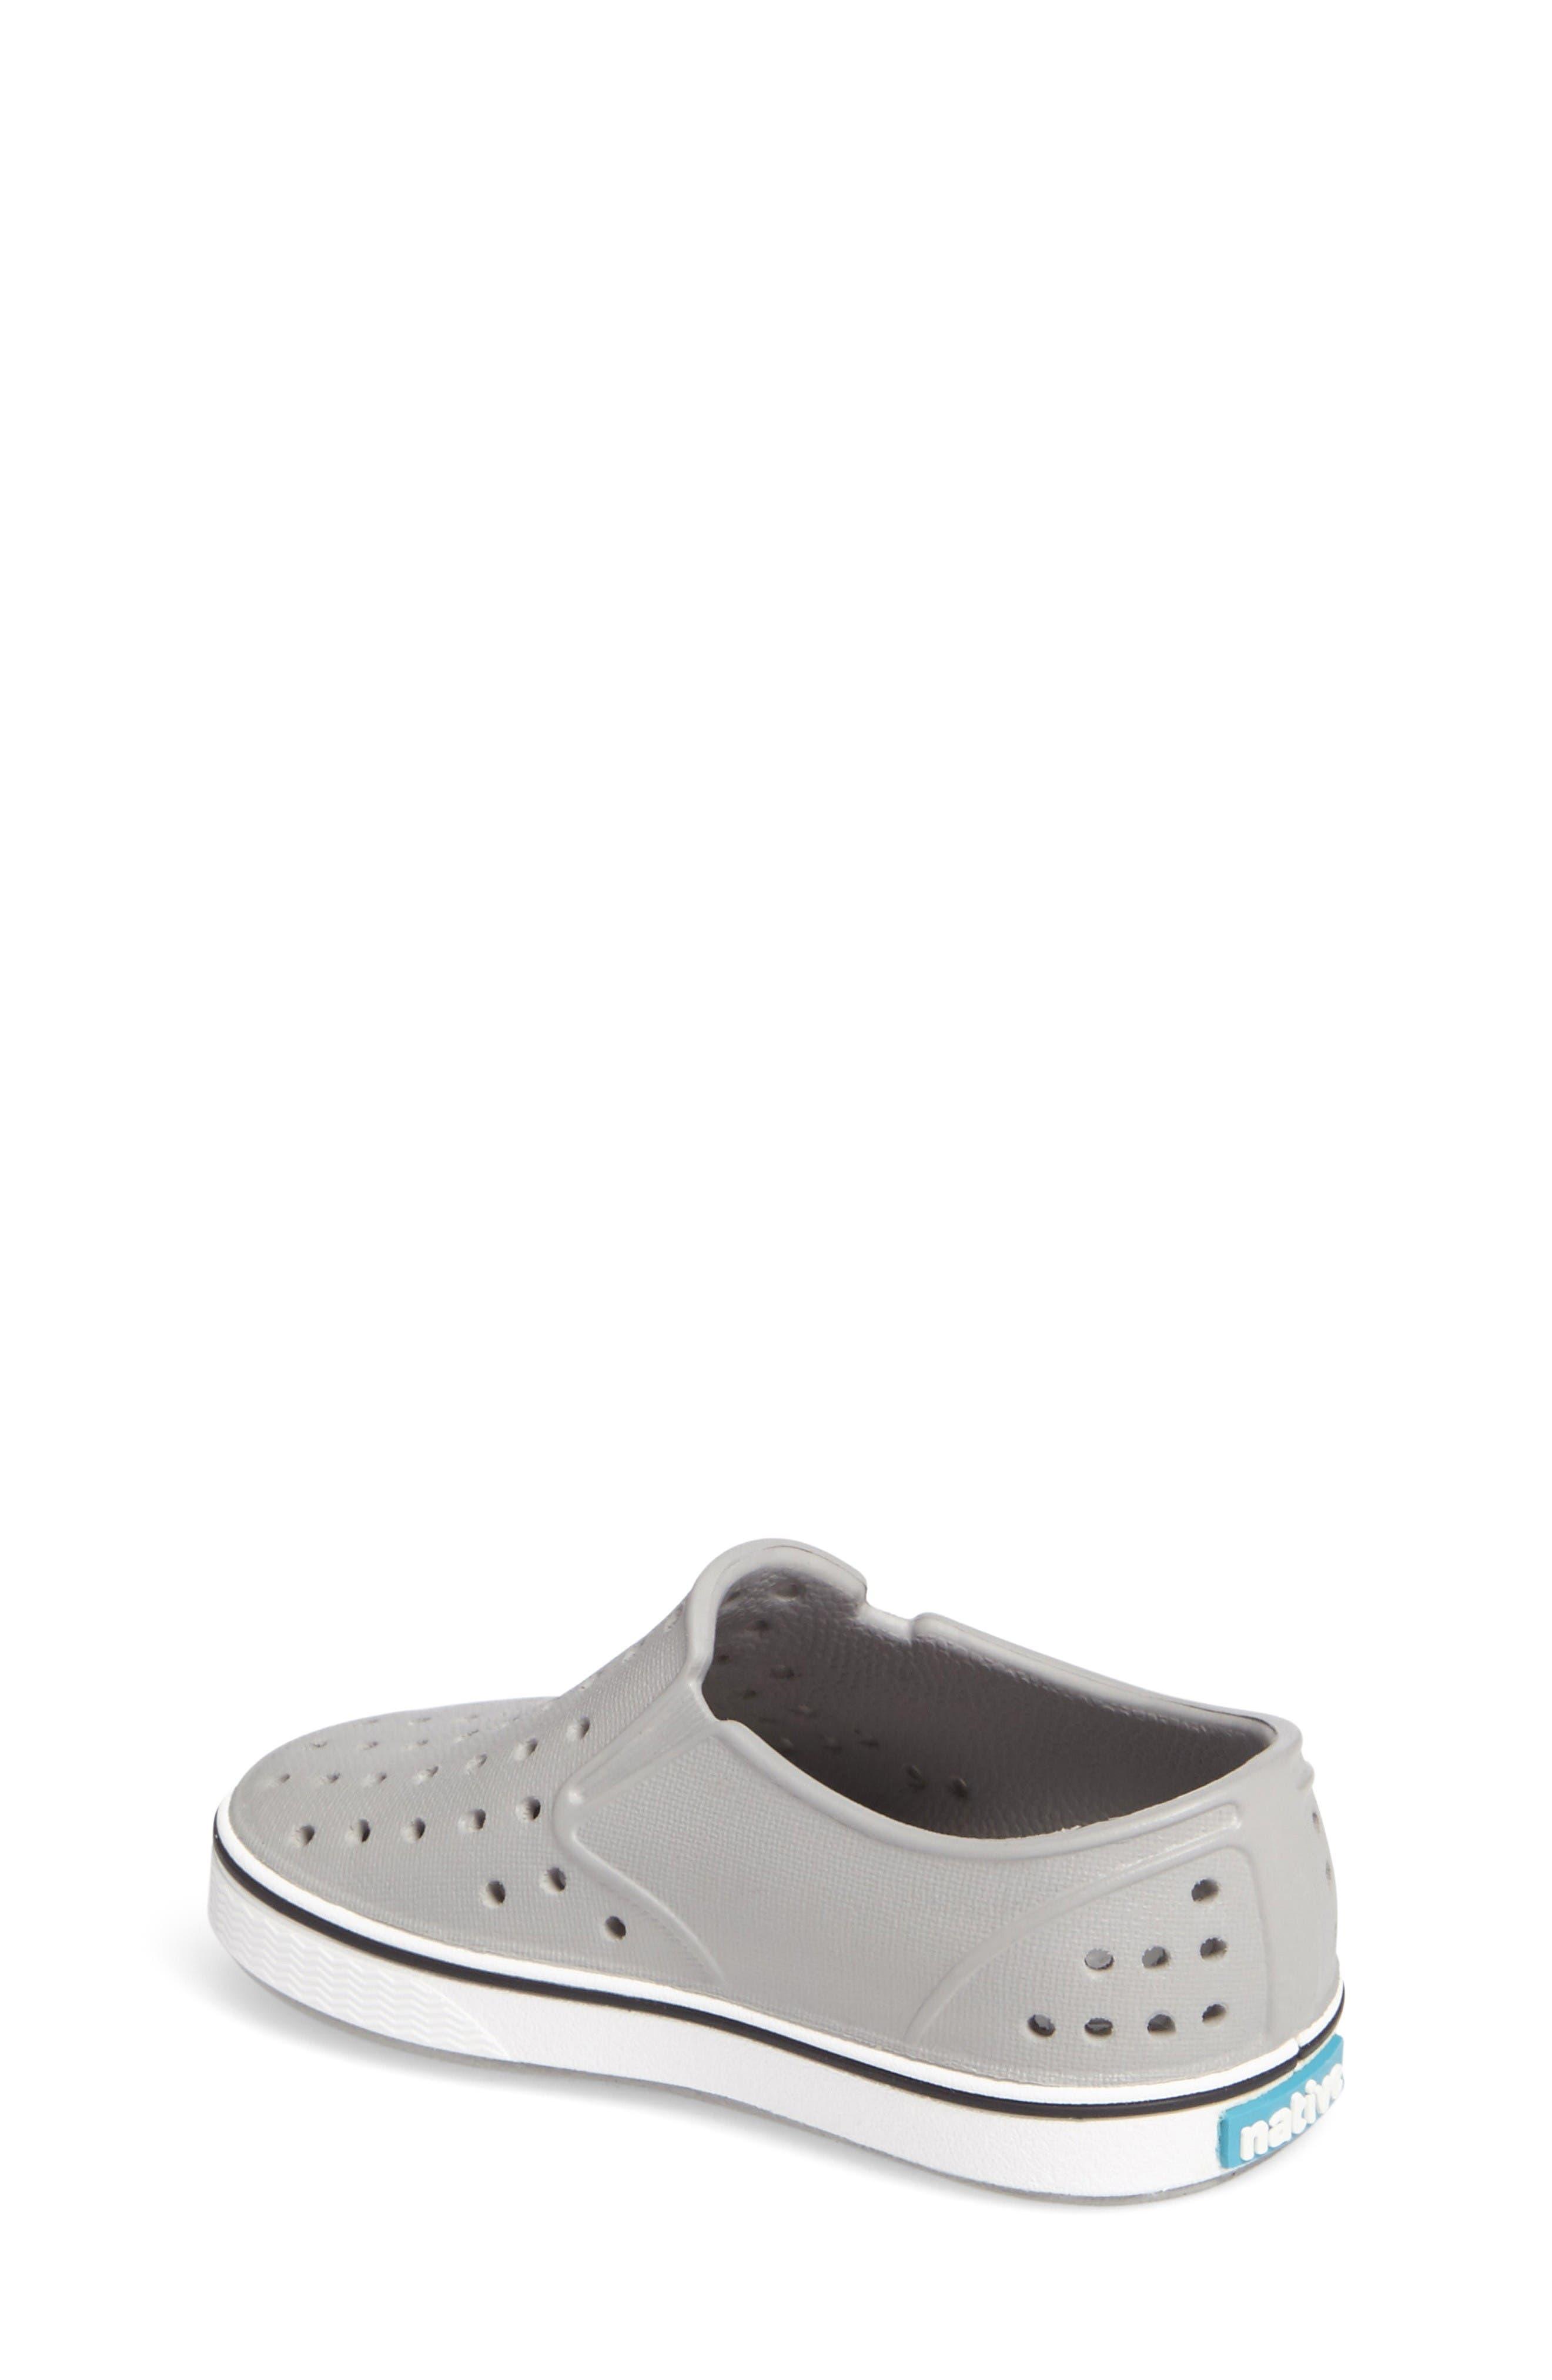 Miles Water Friendly Slip-On Sneaker,                             Alternate thumbnail 2, color,                             Pigeon Grey/ Shell White